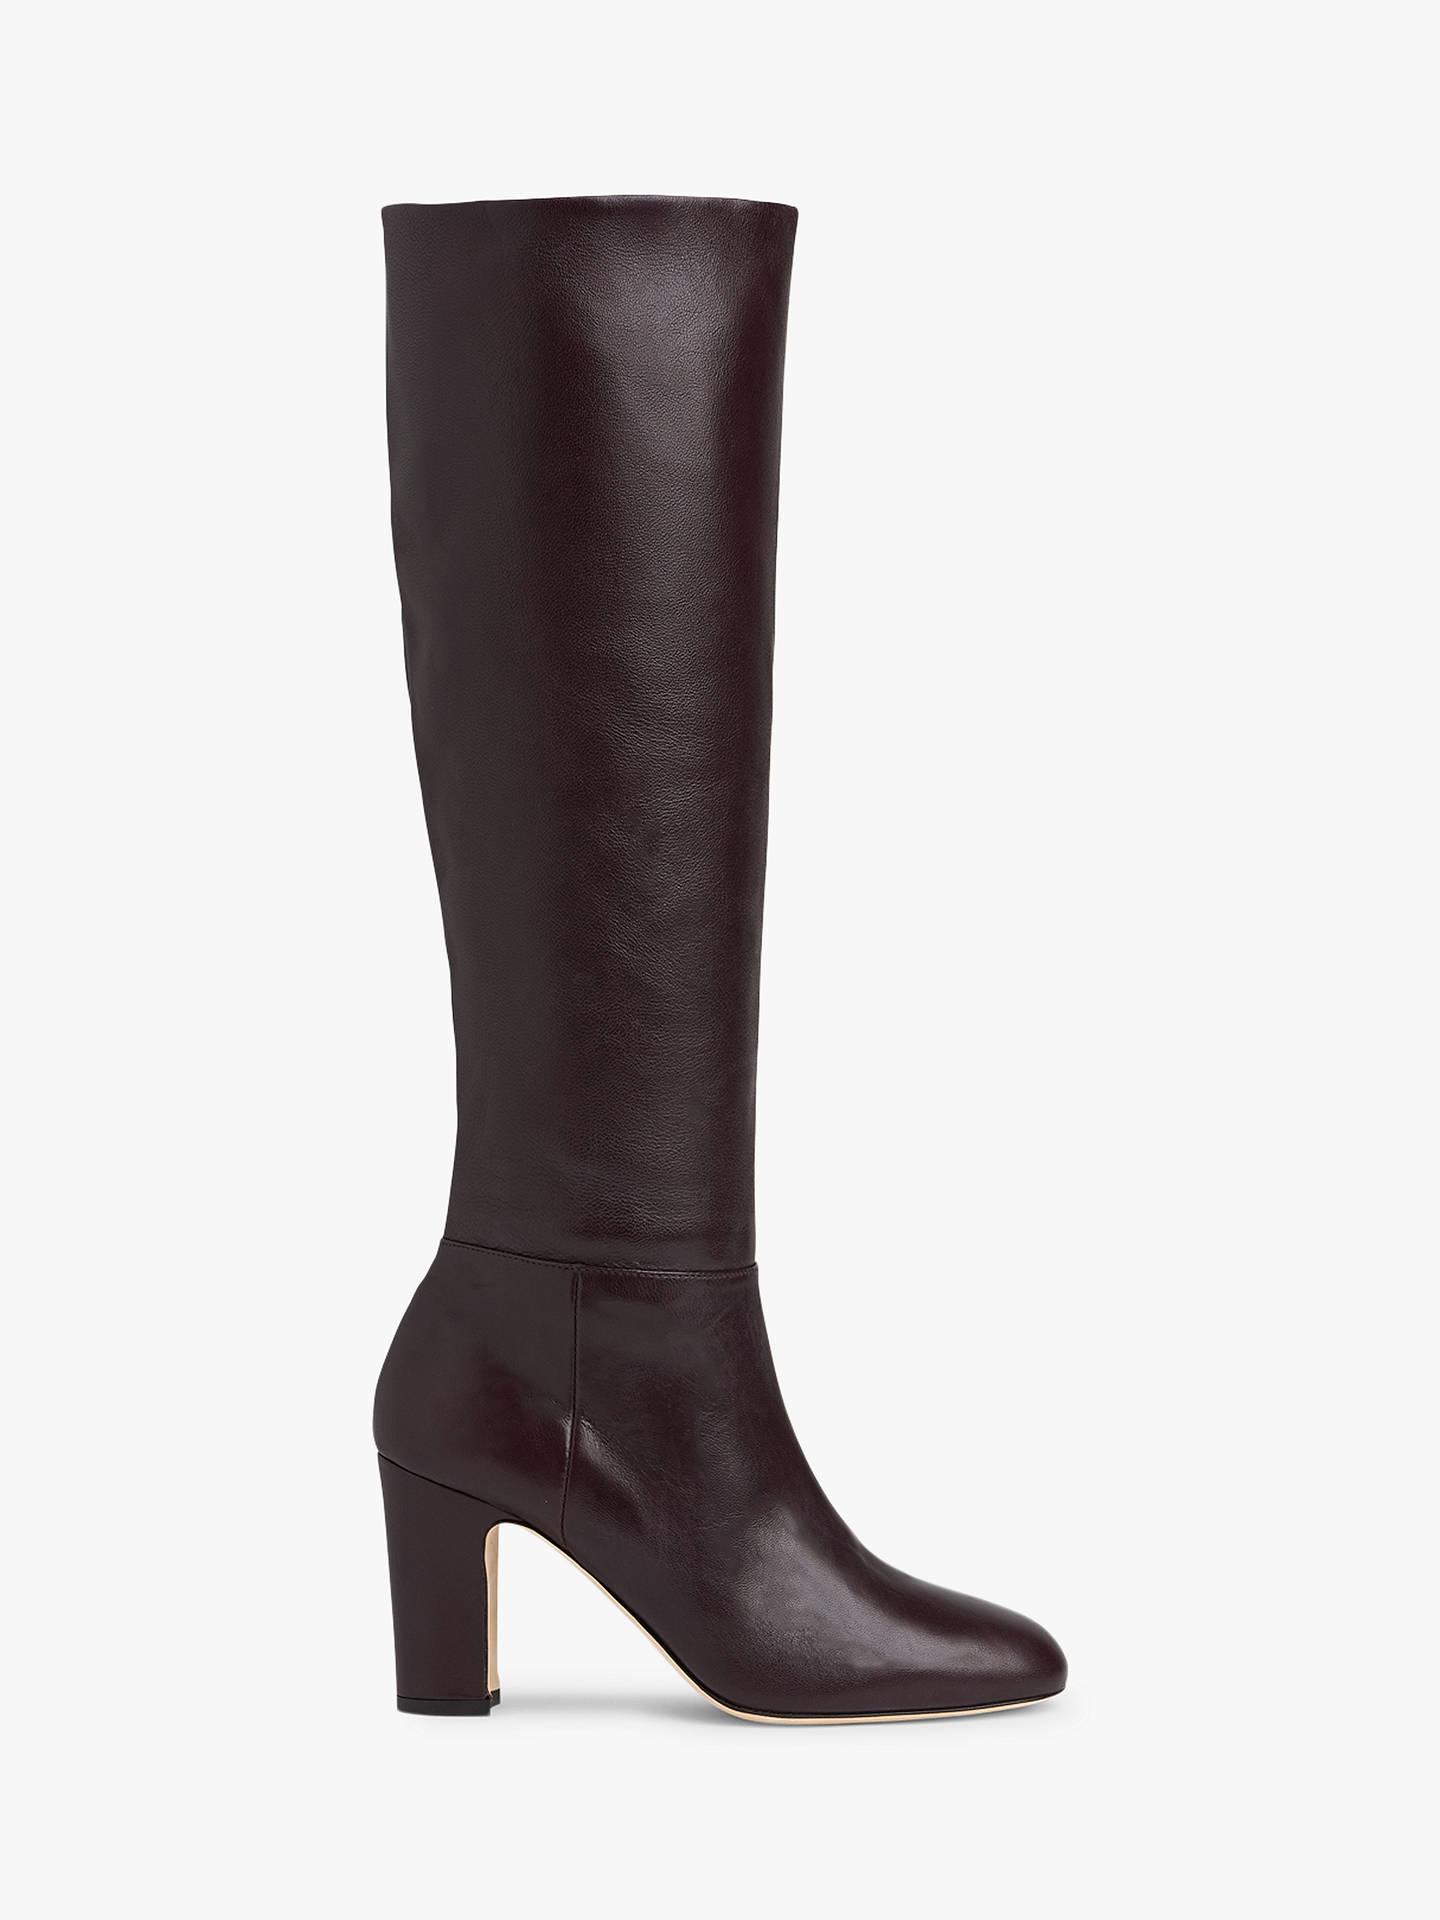 82d80401bc8e3 L.K.Bennett Kristen Knee High Boots, Bordeaux Leather